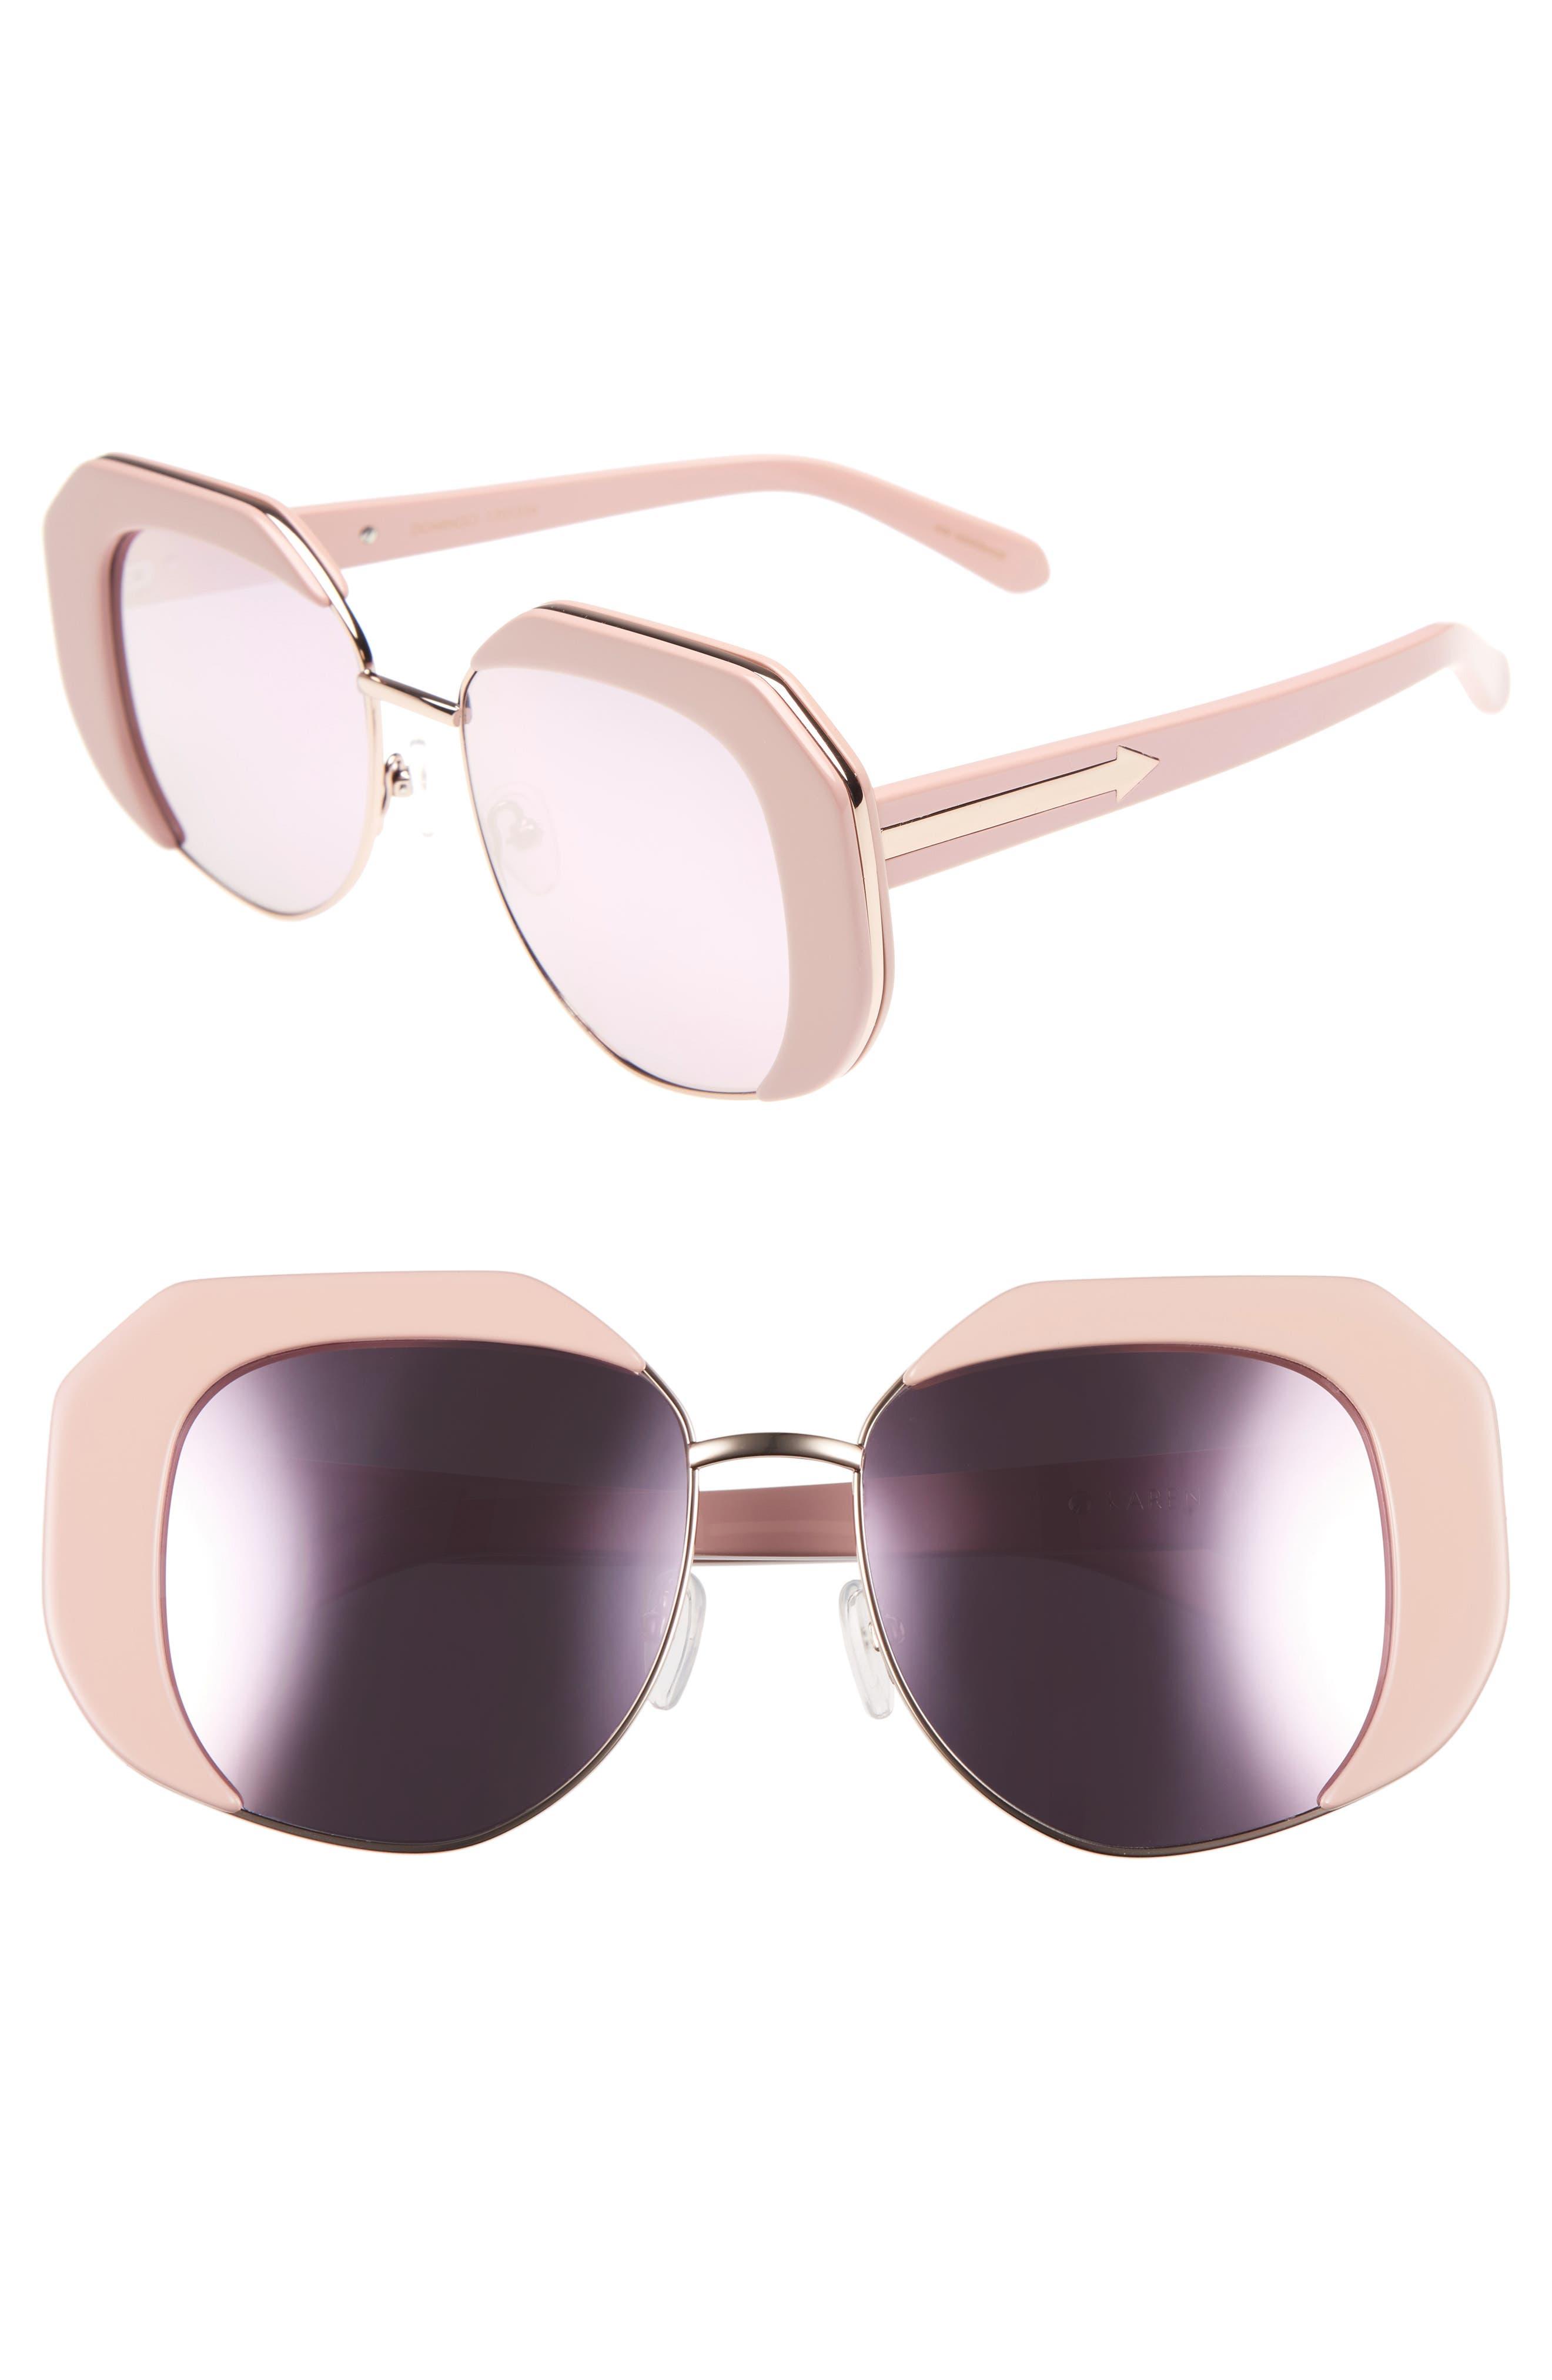 Domingo 52mm Sunglasses,                             Main thumbnail 1, color,                             Pink/ Rose Gold